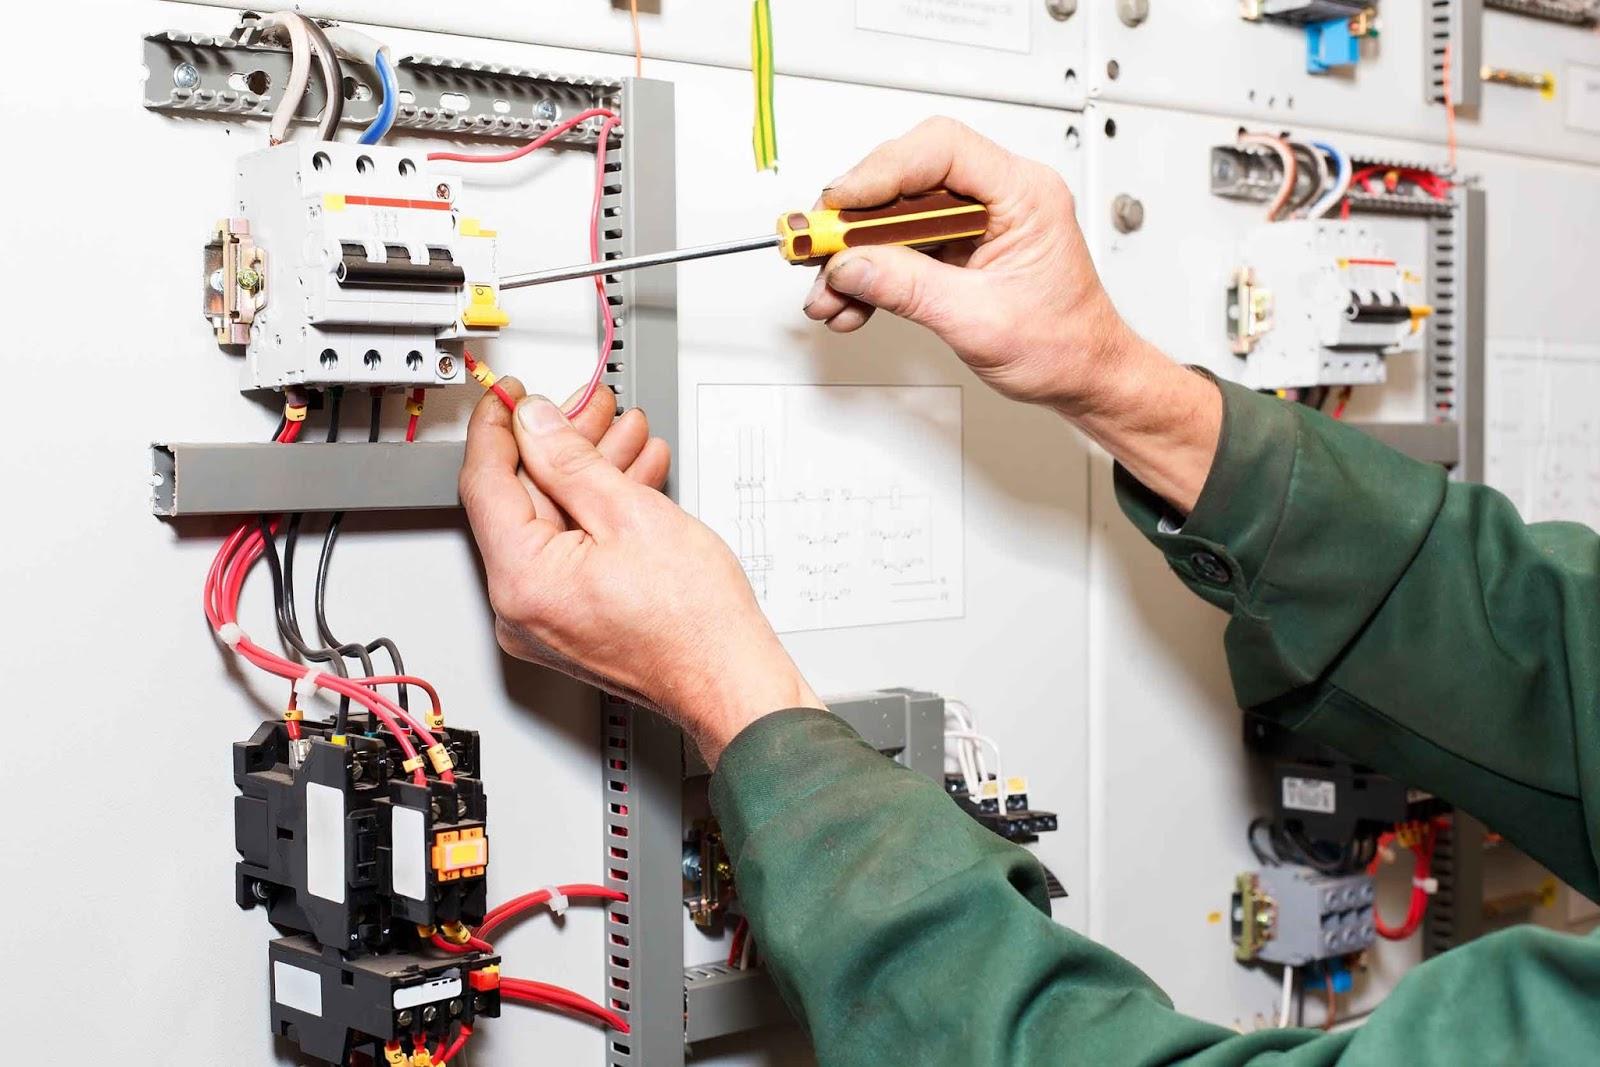 Electrical Wiring Electronics Installation Maintenance Ananta Service Best Electrician In Bhubaneswar Provider Odisha